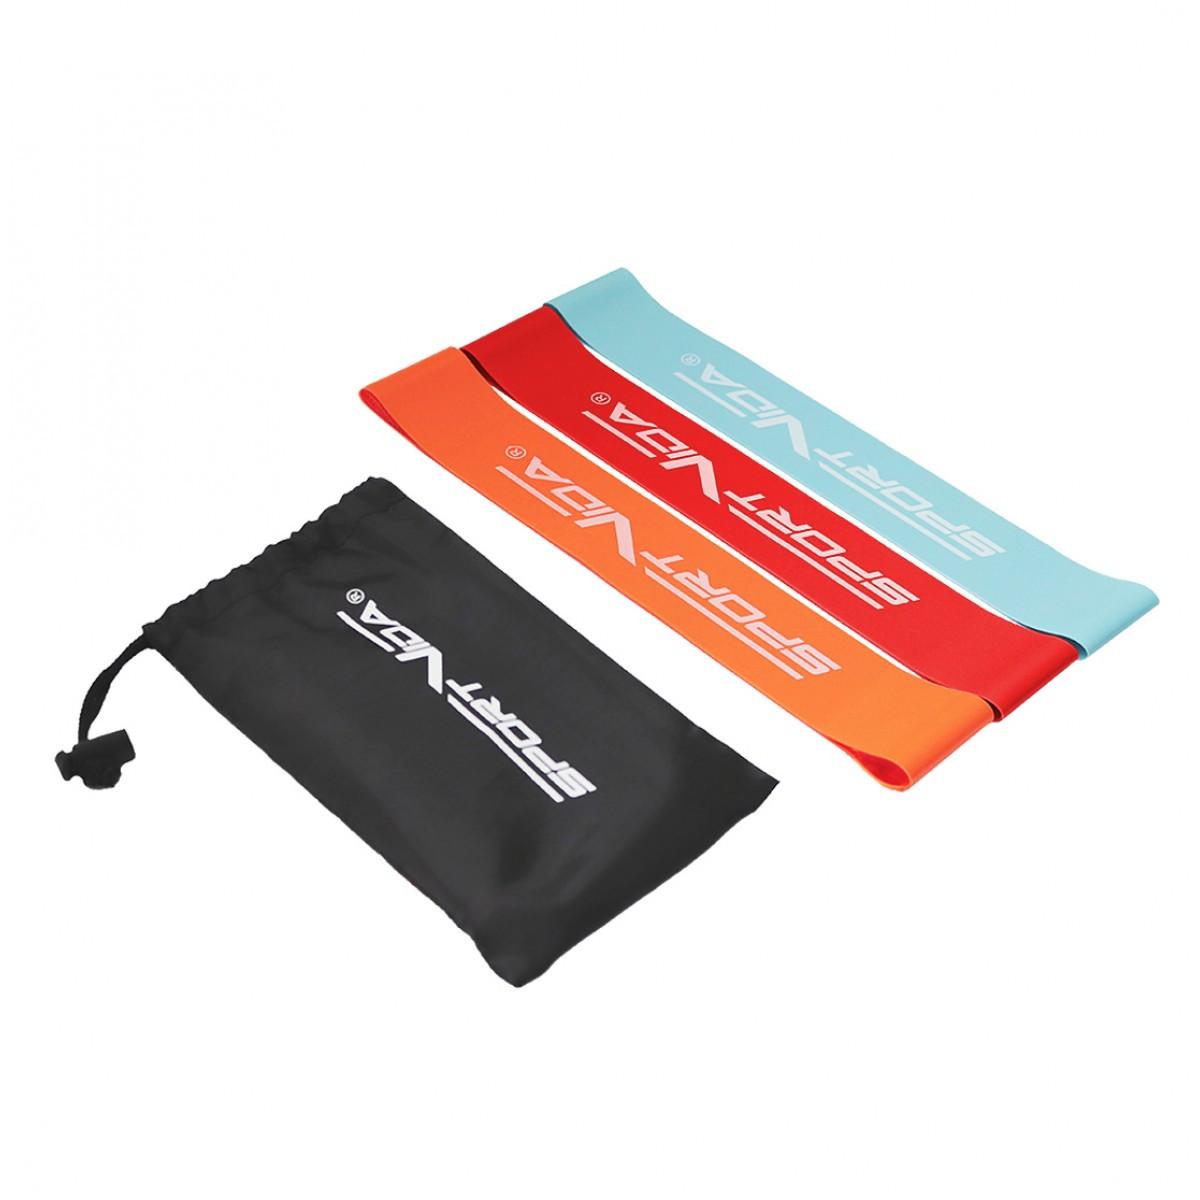 Резинка для фитнеса и спорта (лента-эспандер) SportVida Mini Power Band 3 шт 0-15 кг SV-HK0205-1